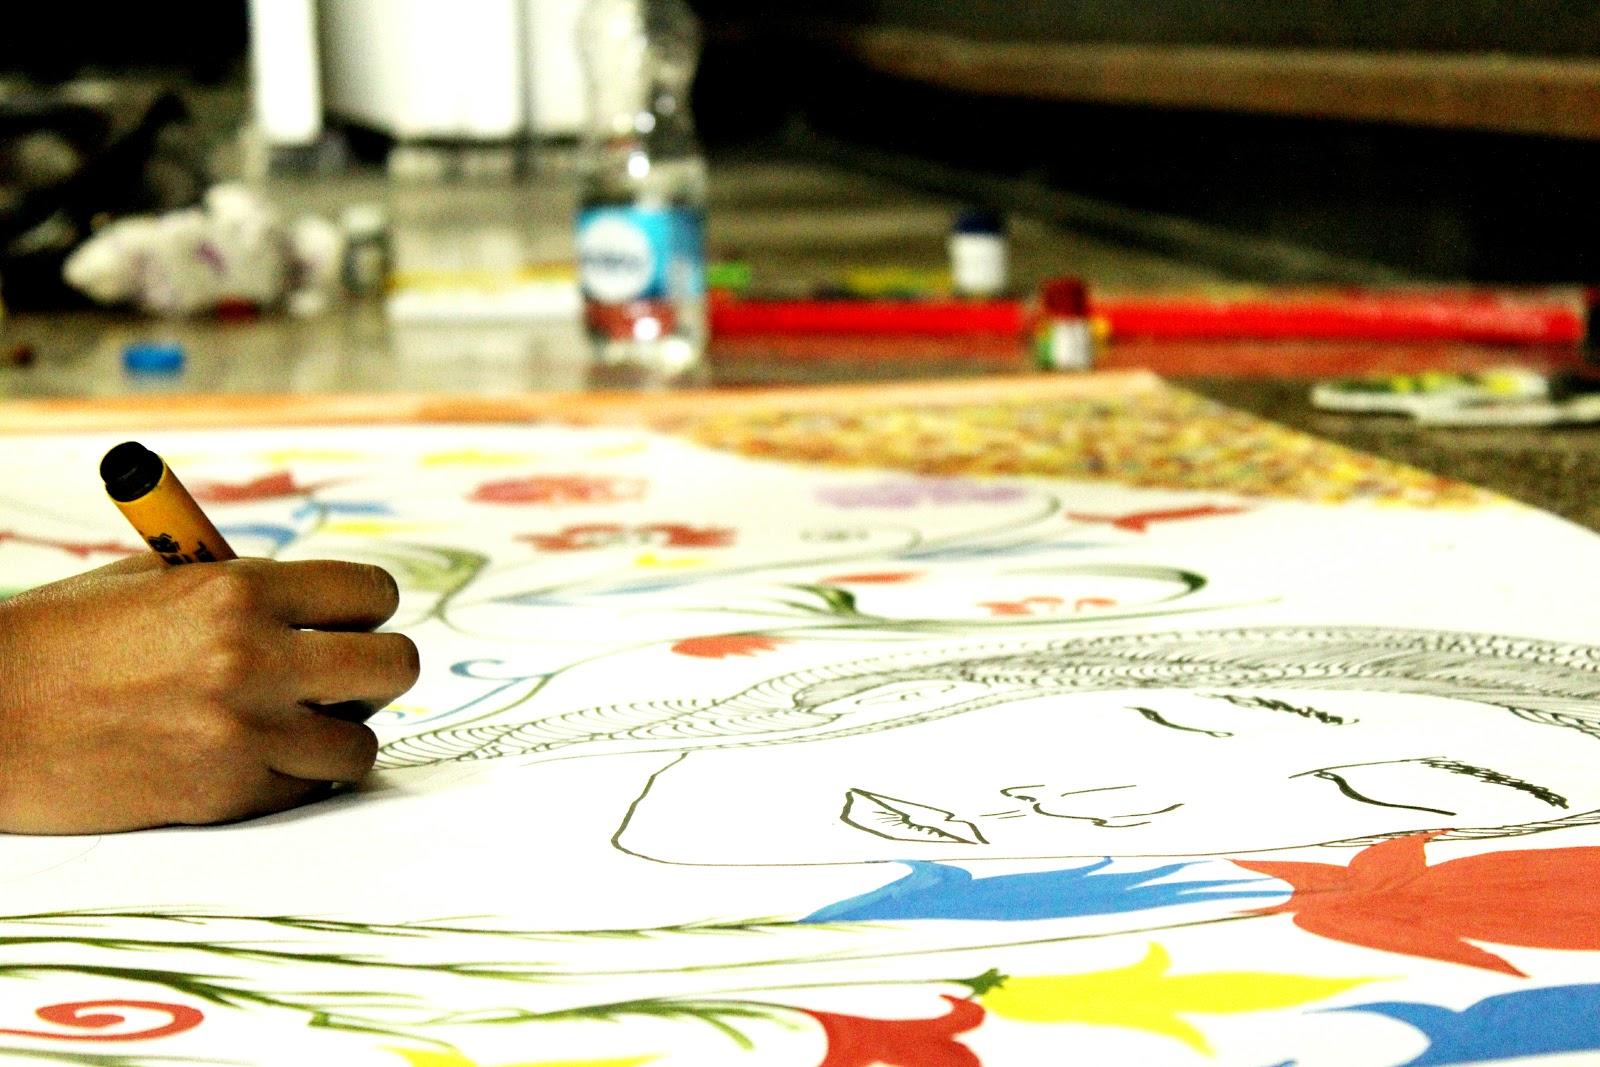 School of Fashion Design Organised A \'Street Art, Graffiti and Wall ...